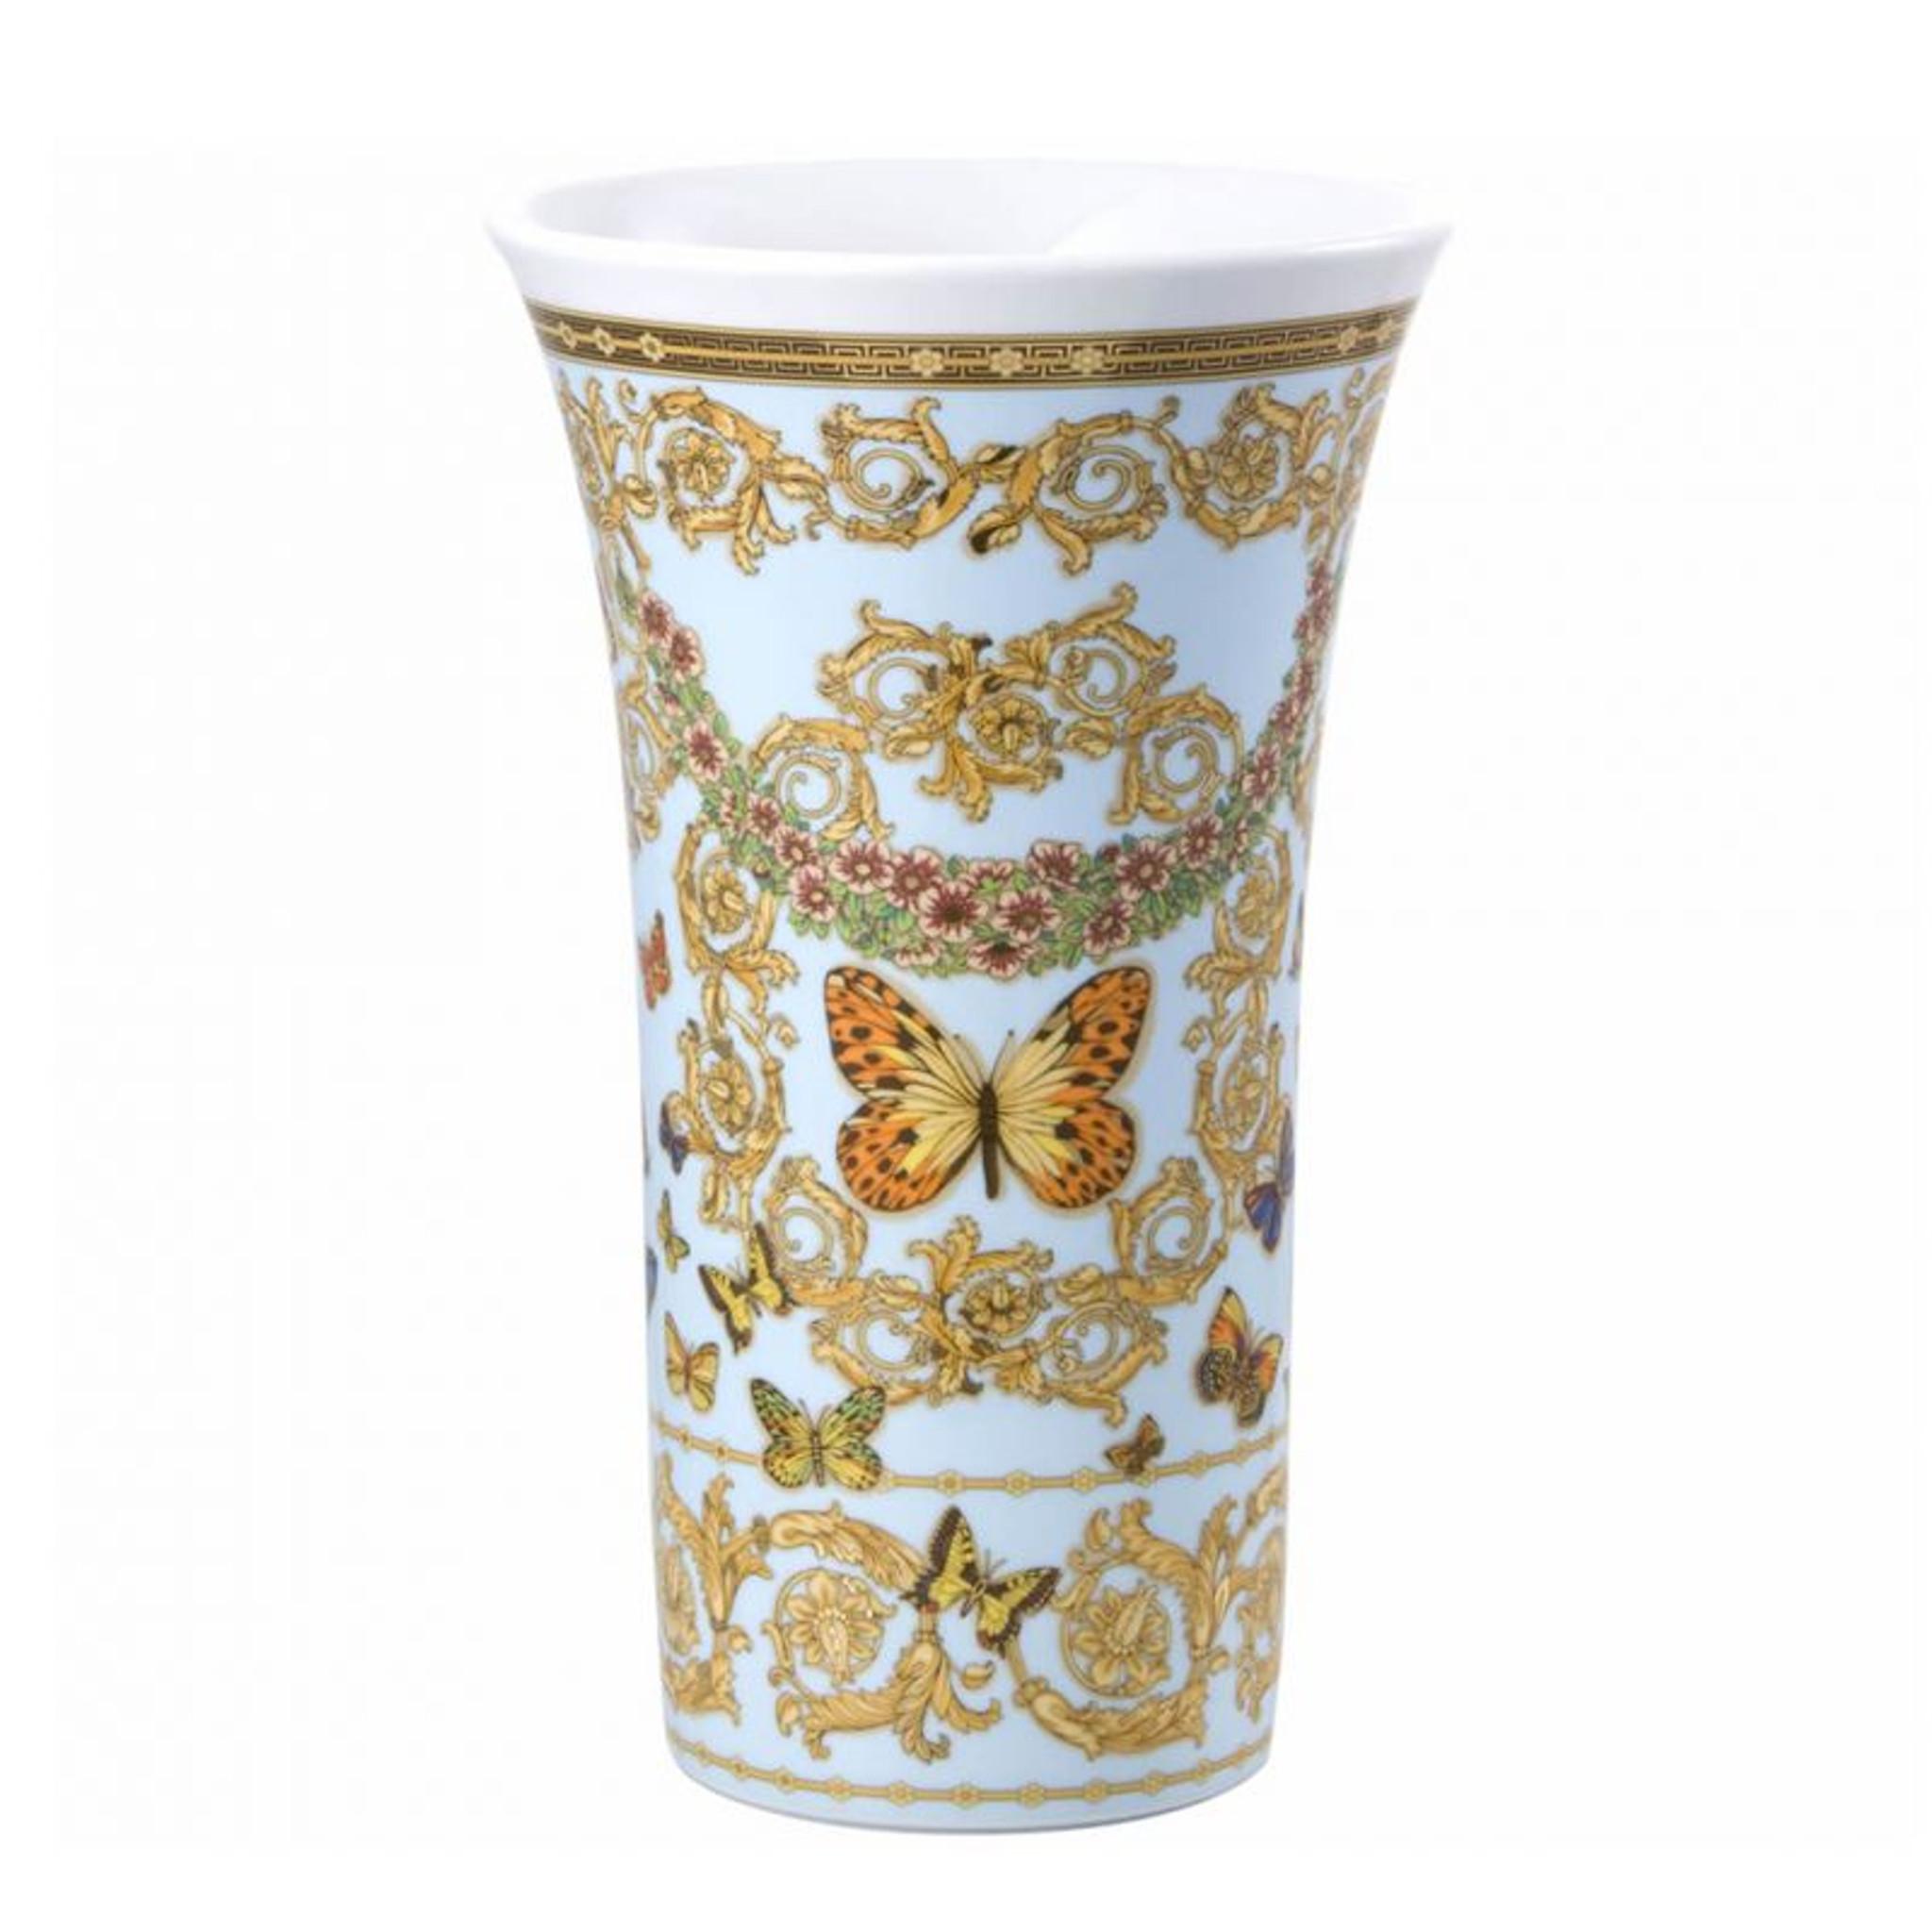 Versace Butterfly Garden Vase Porcelain 13 1 2 Inch Upc 790955127586 Homebello